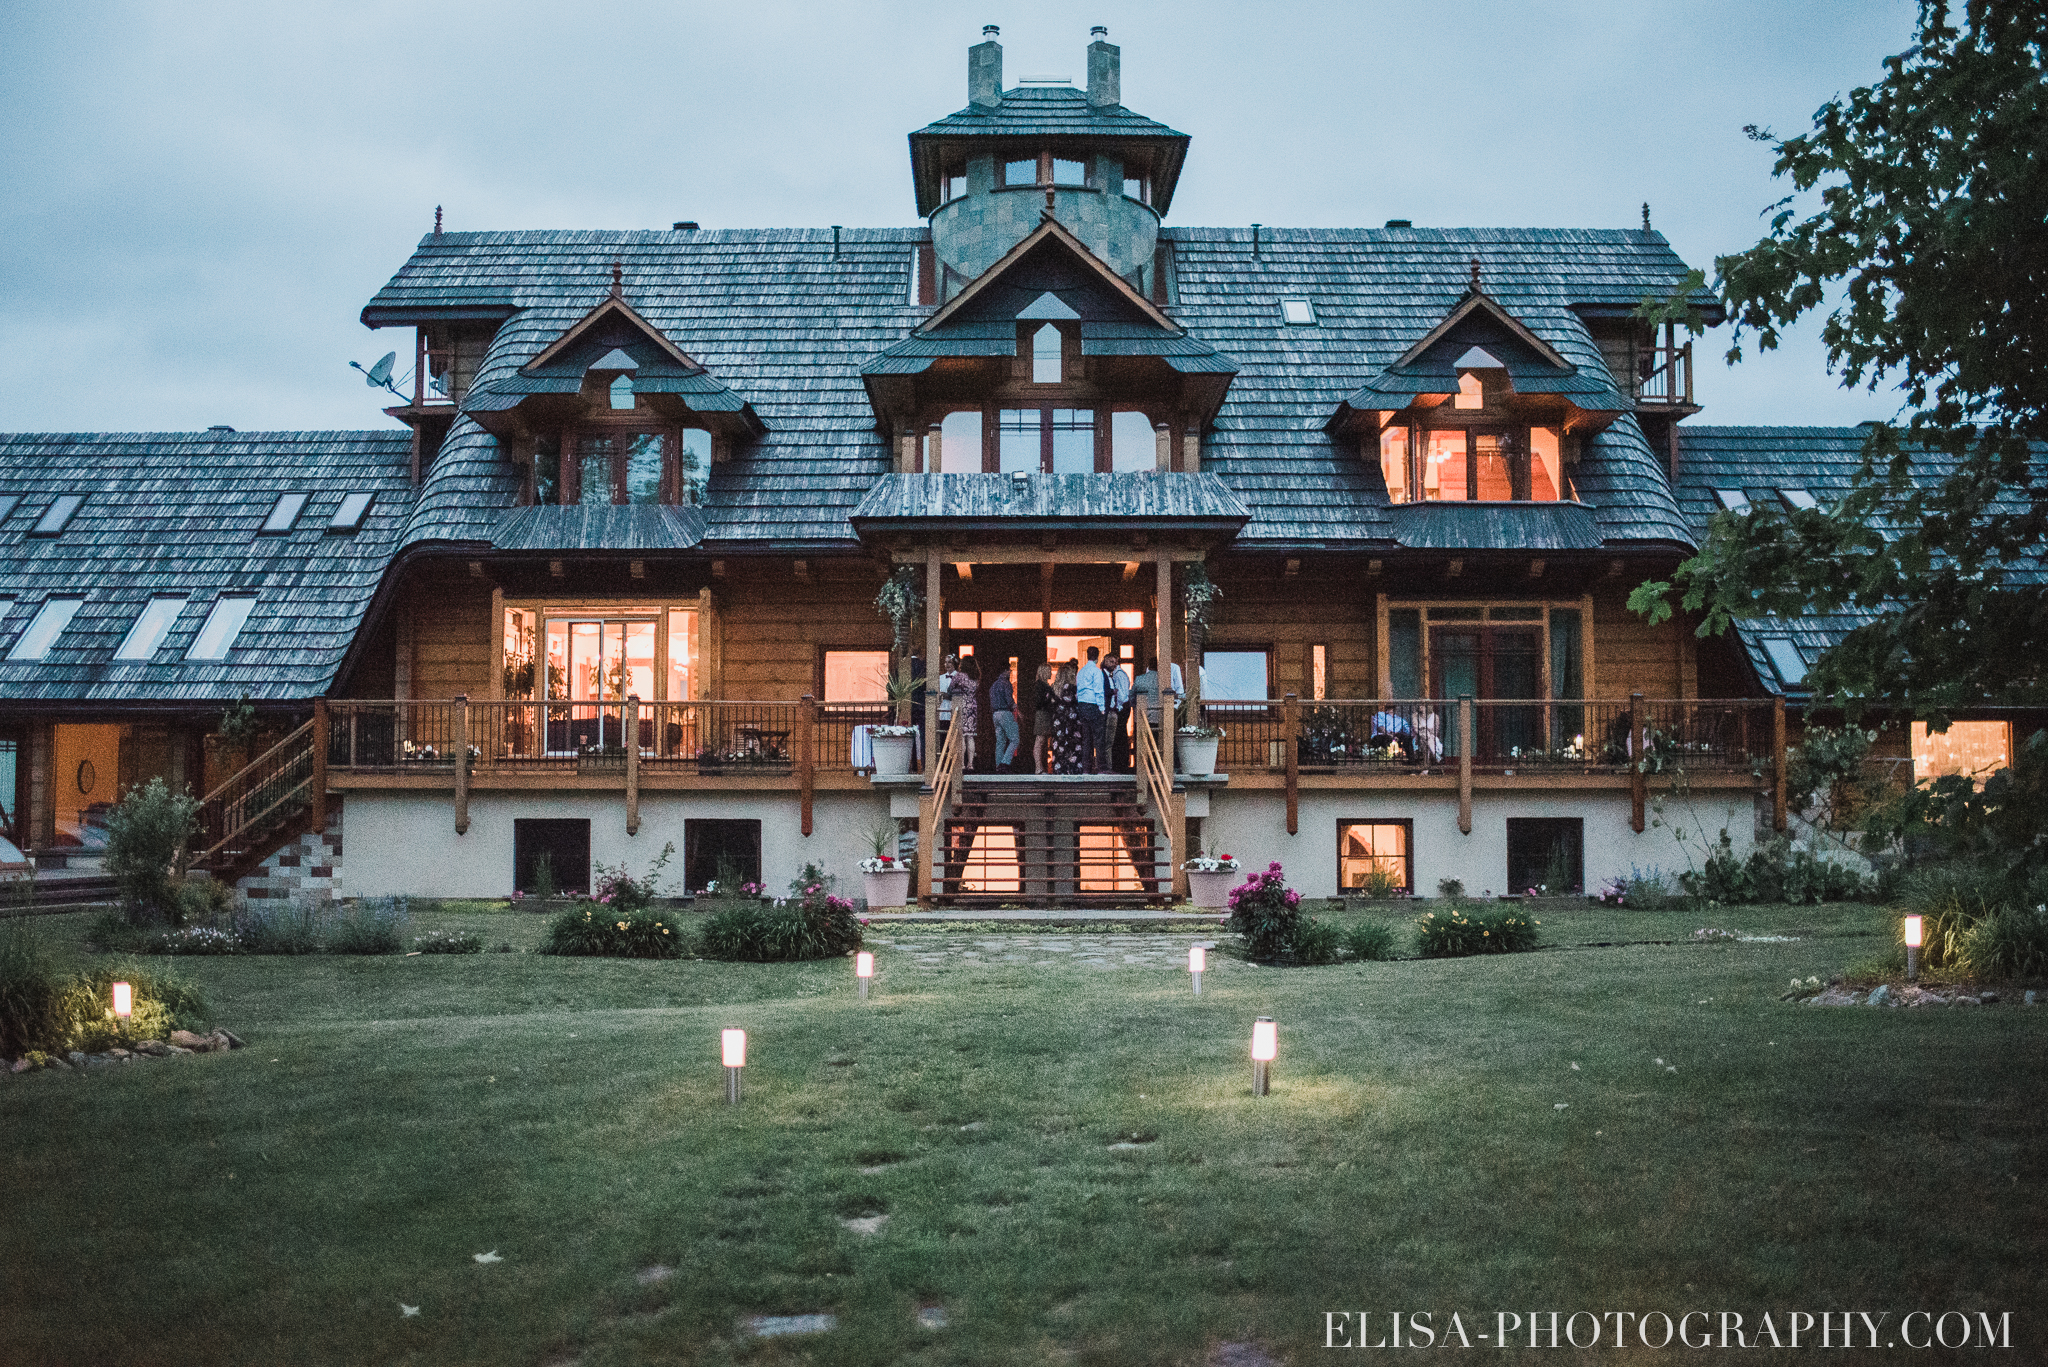 photo mariage a la montagne domaine tomali maniatin reception lifestyle 6985 - Mariage à la montagne au domaine Tomali-Maniatyn